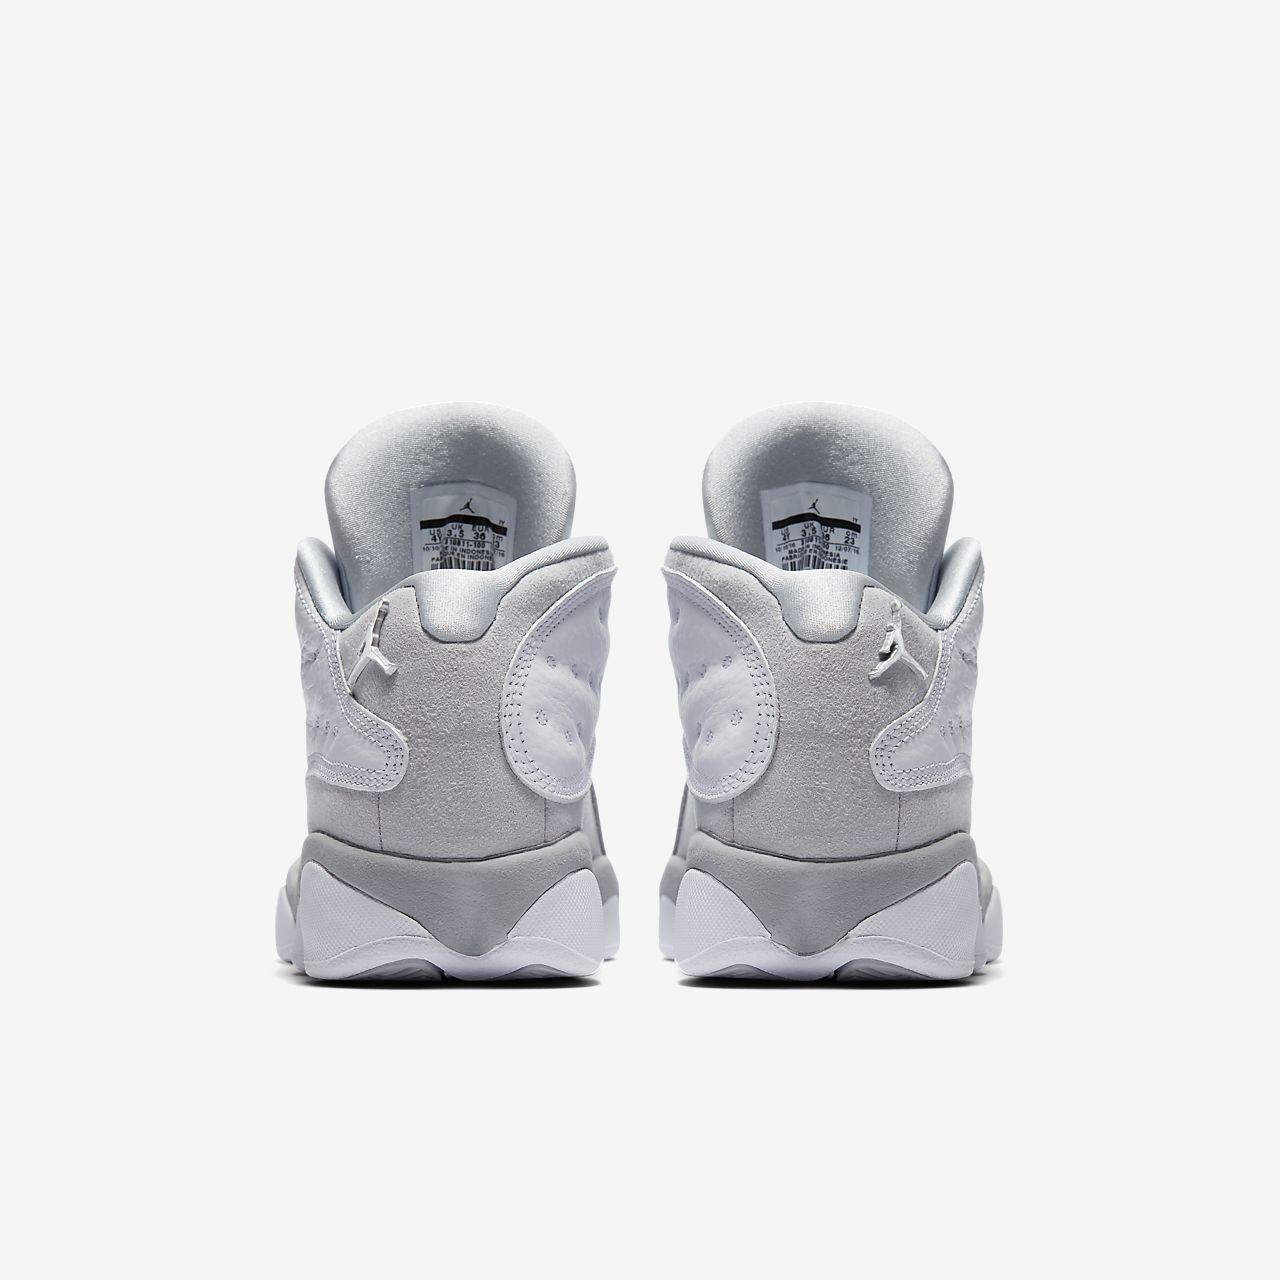 new product 1ef3a a8f44 ... Air Jordan 13 Retro Low Older Kids  Shoe